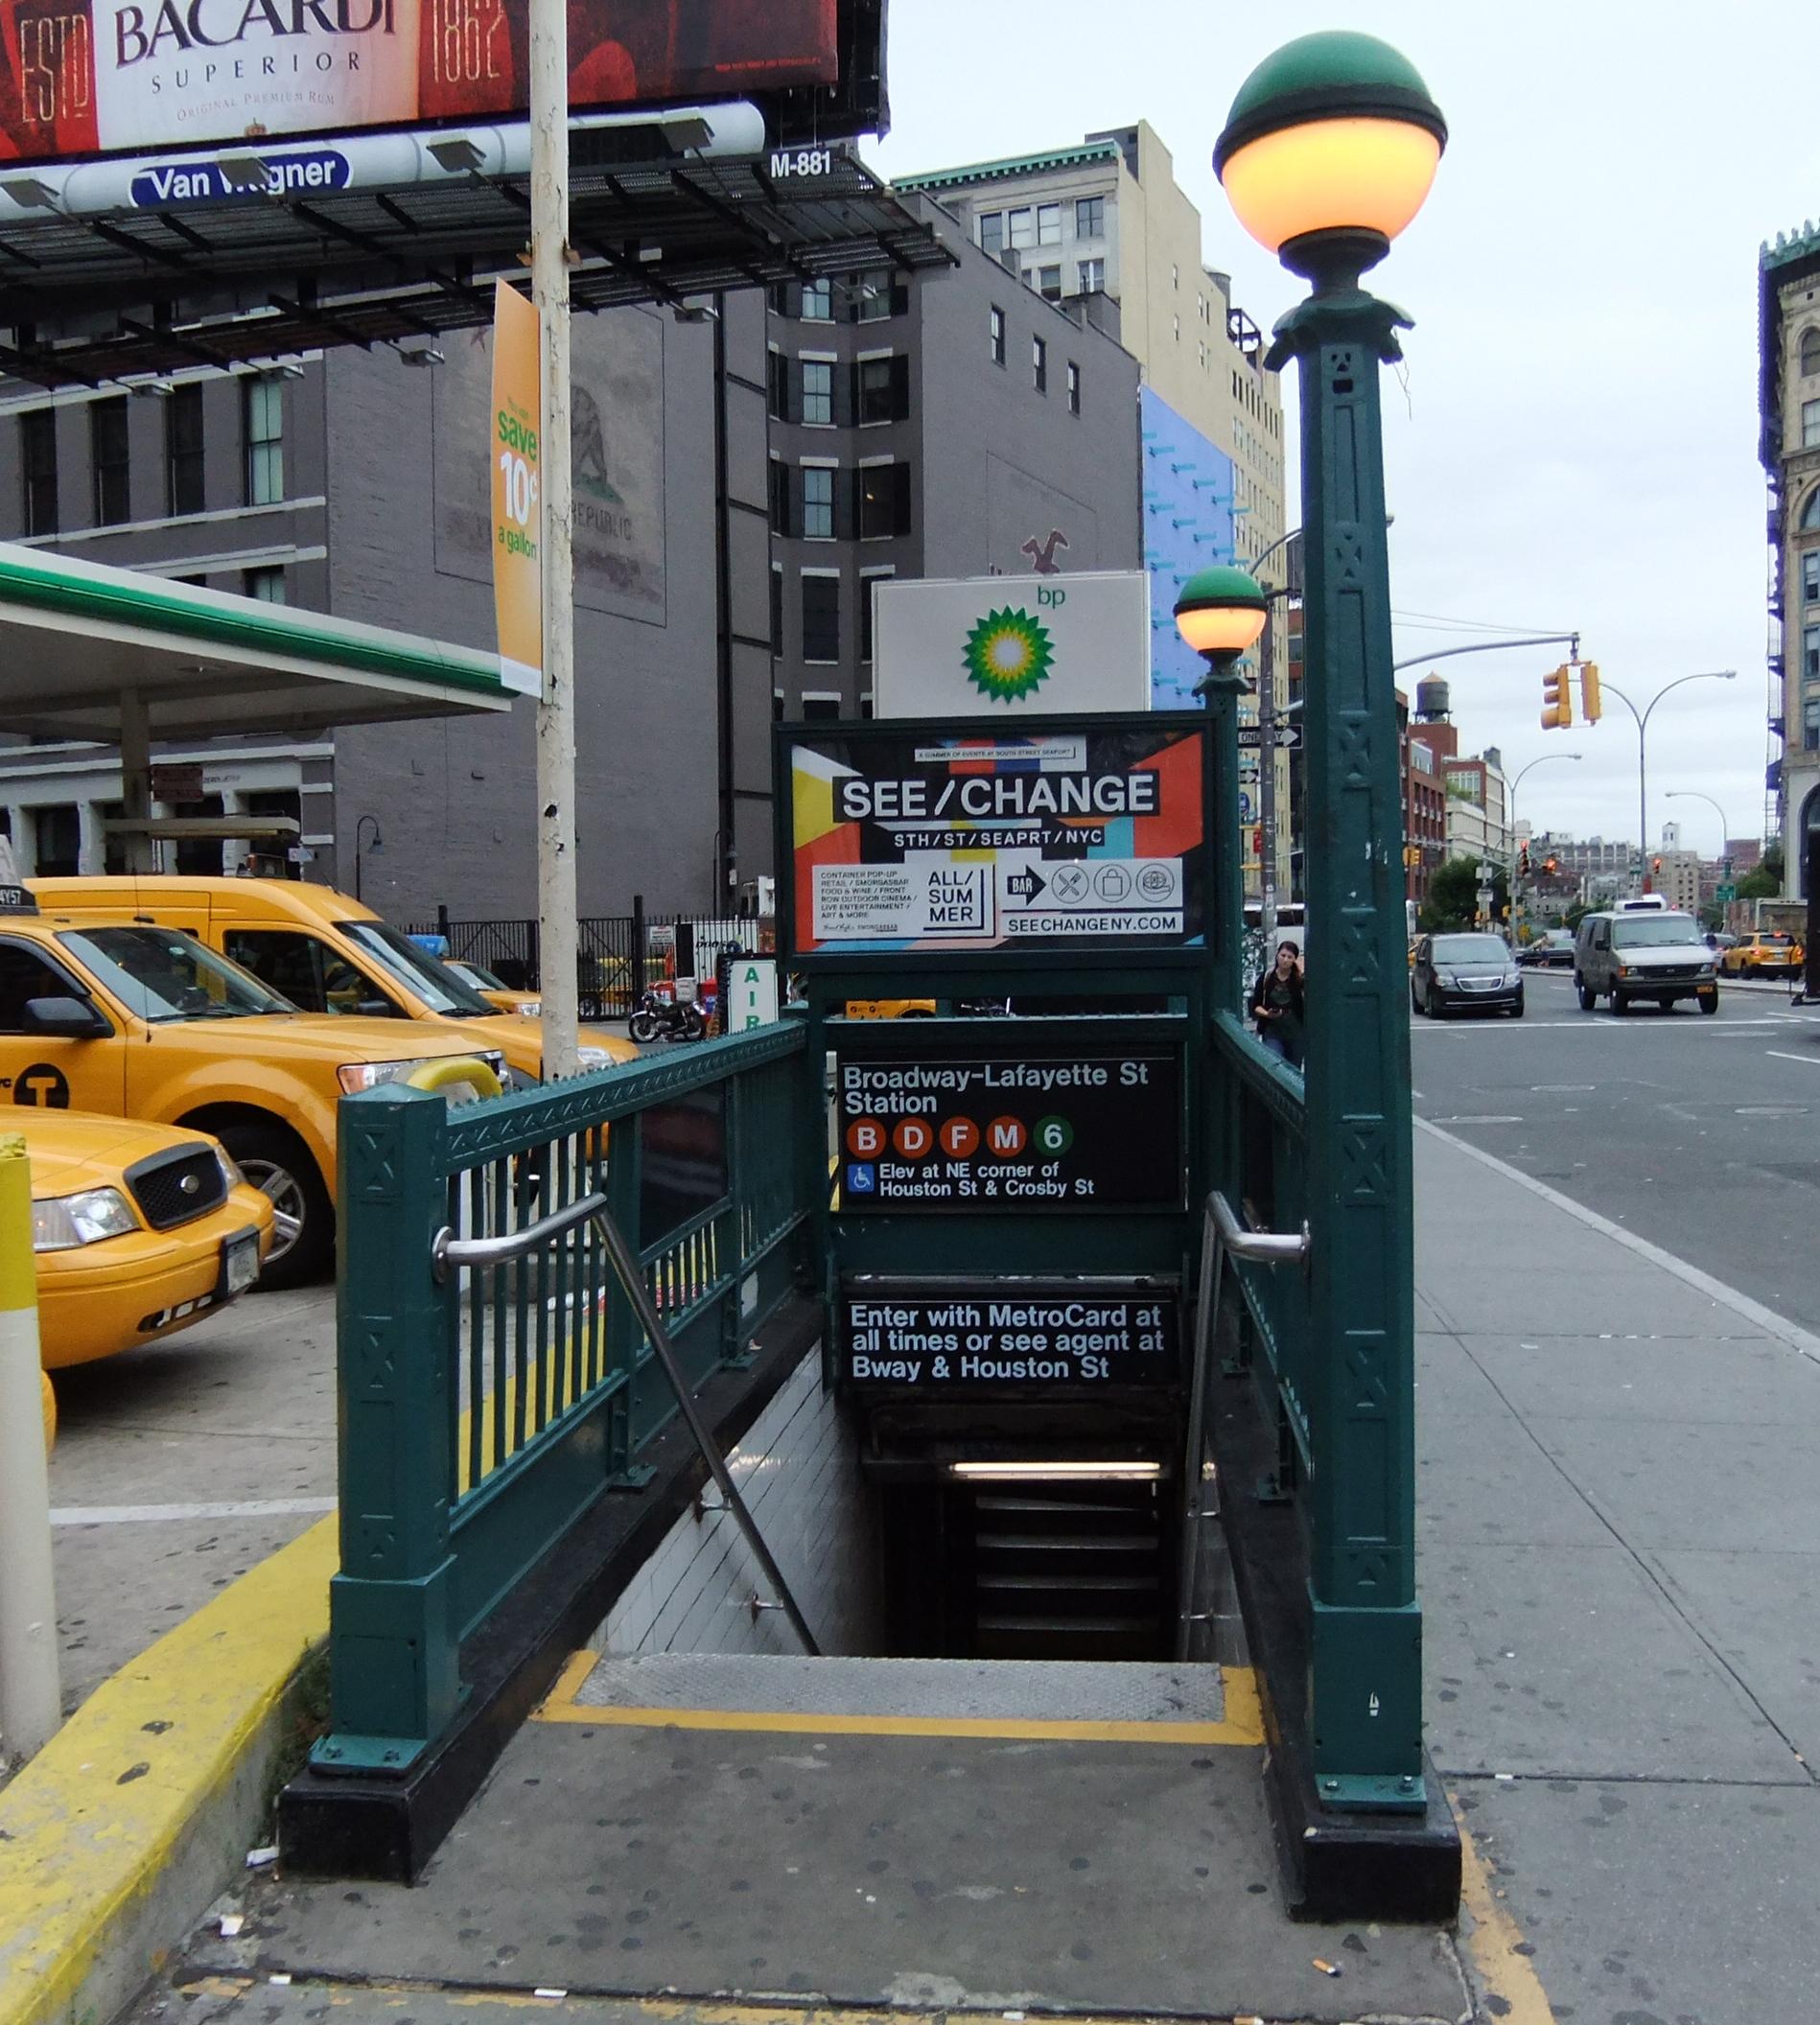 Bleecker Street/Broadway–Lafayette Street (New York City